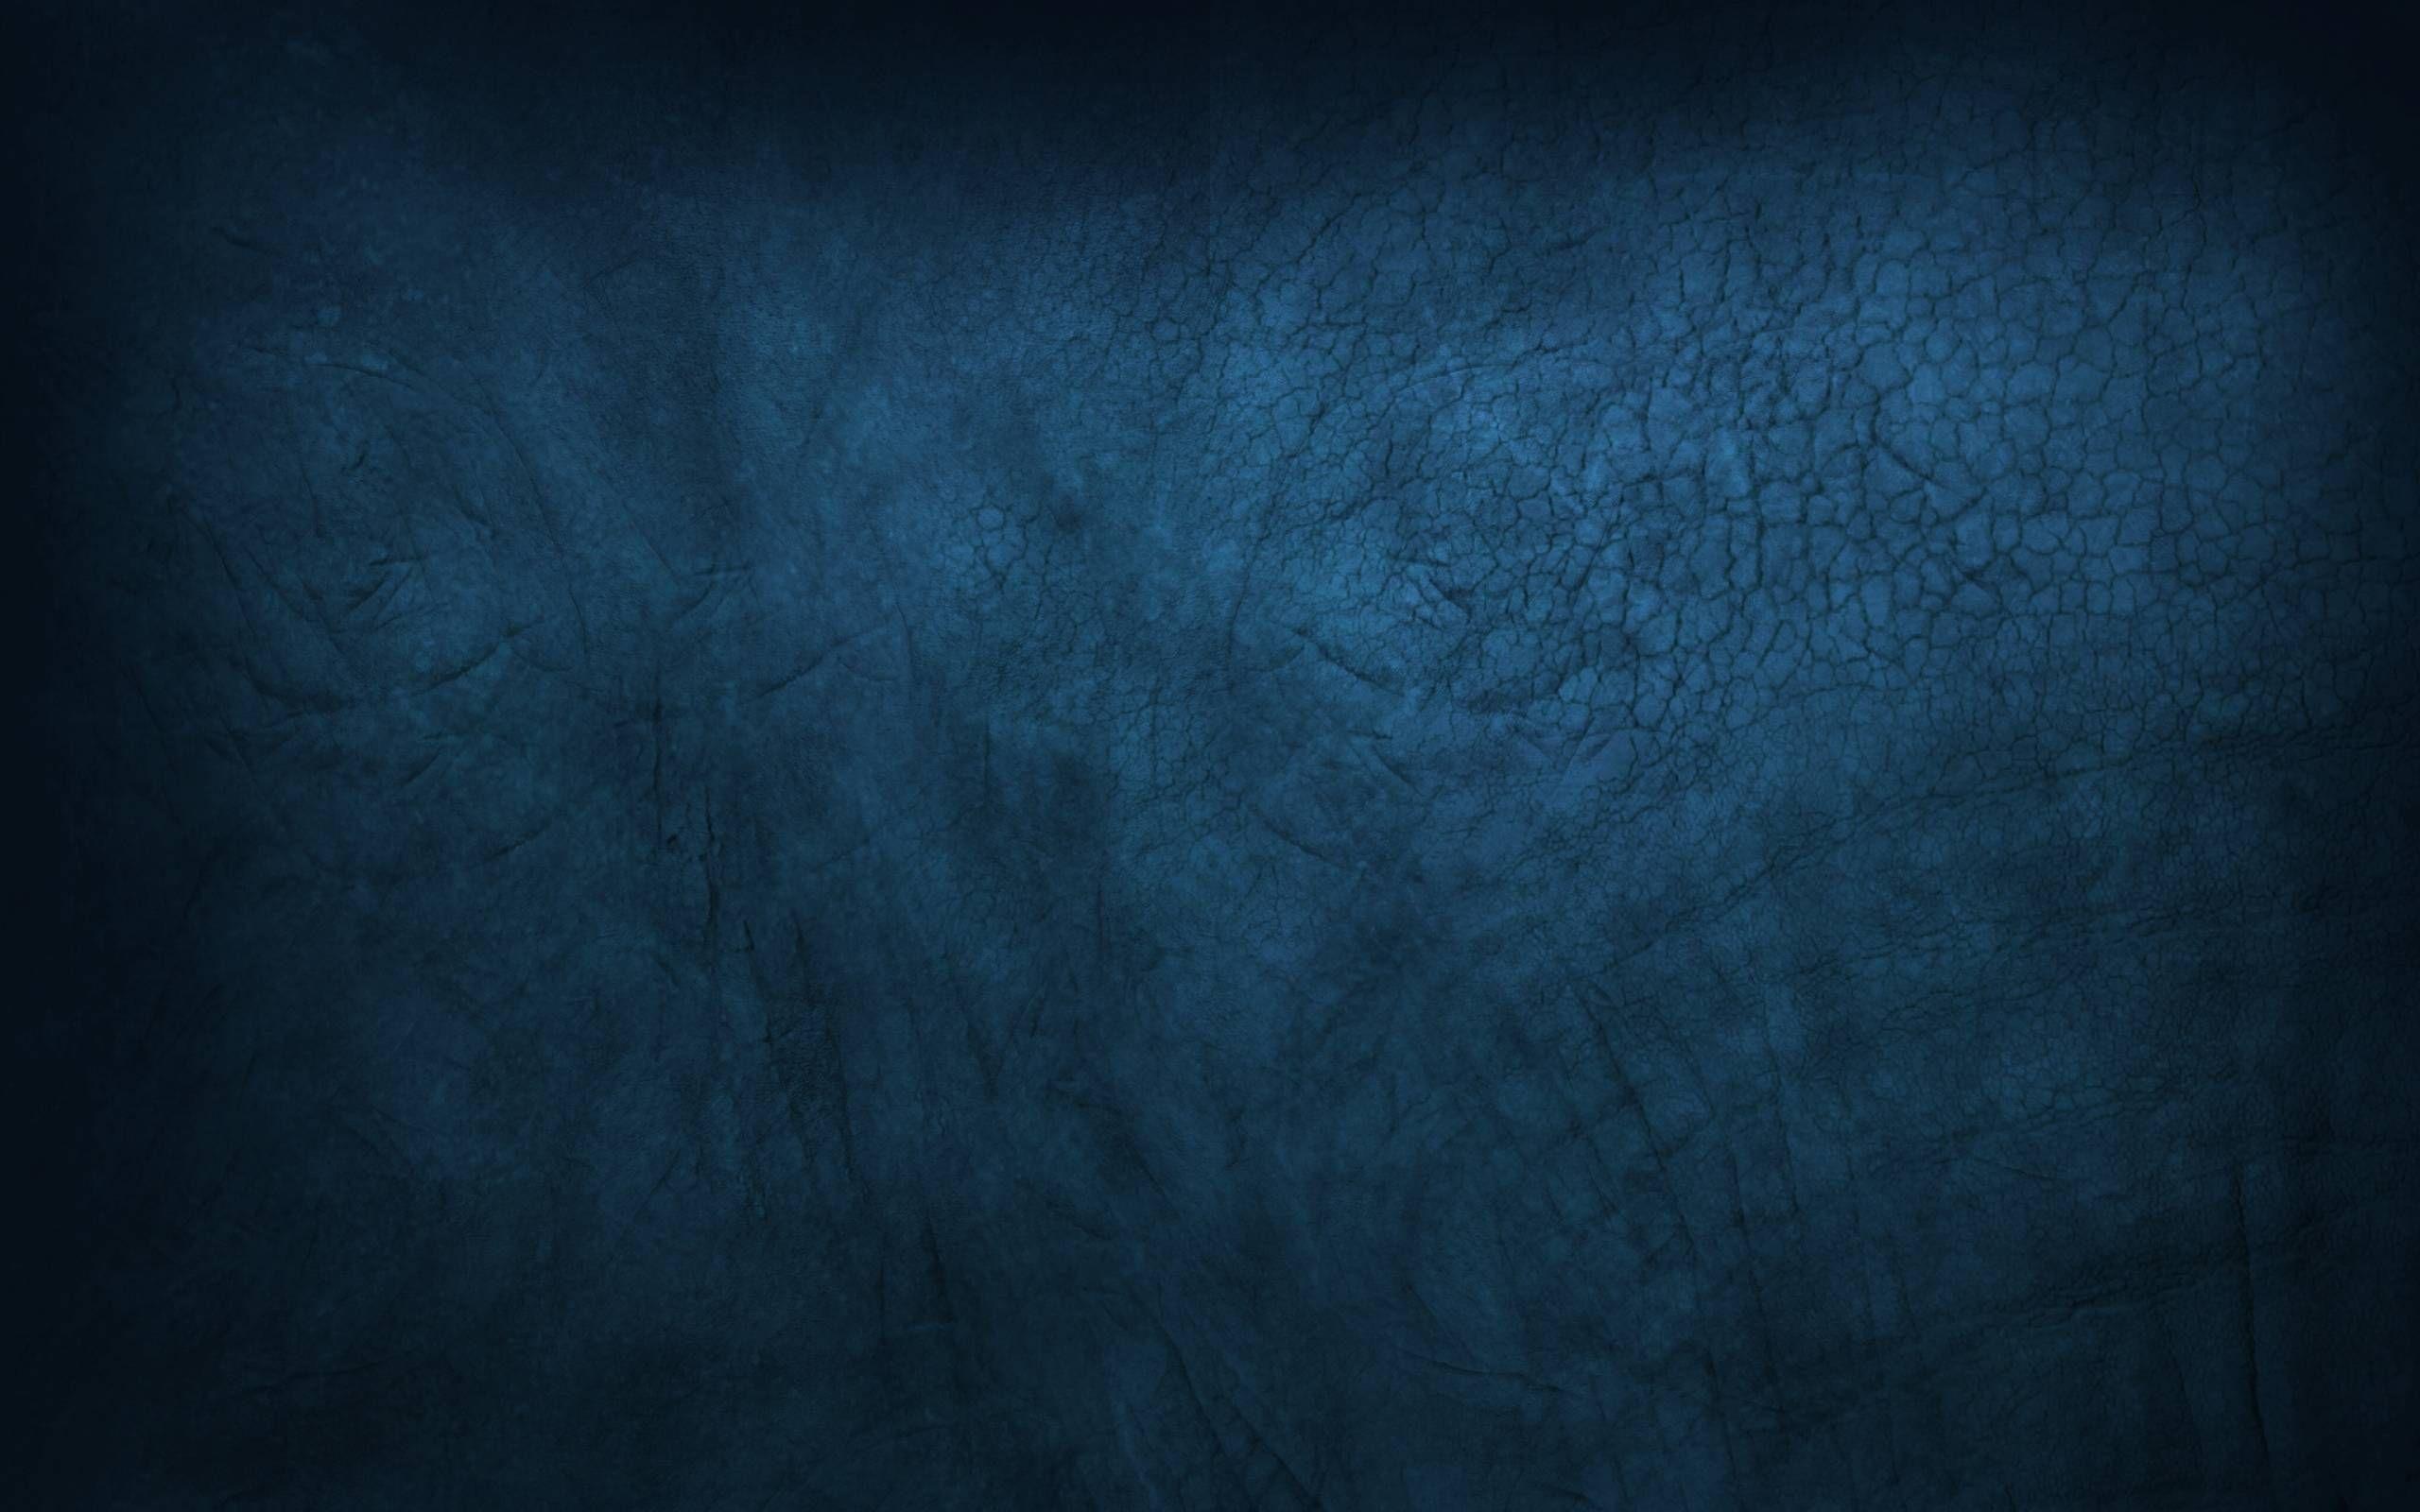 Download 30 Texture Wallpapers Aivanet Textured Wallpaper Background Hd Wallpaper Grunge Textures